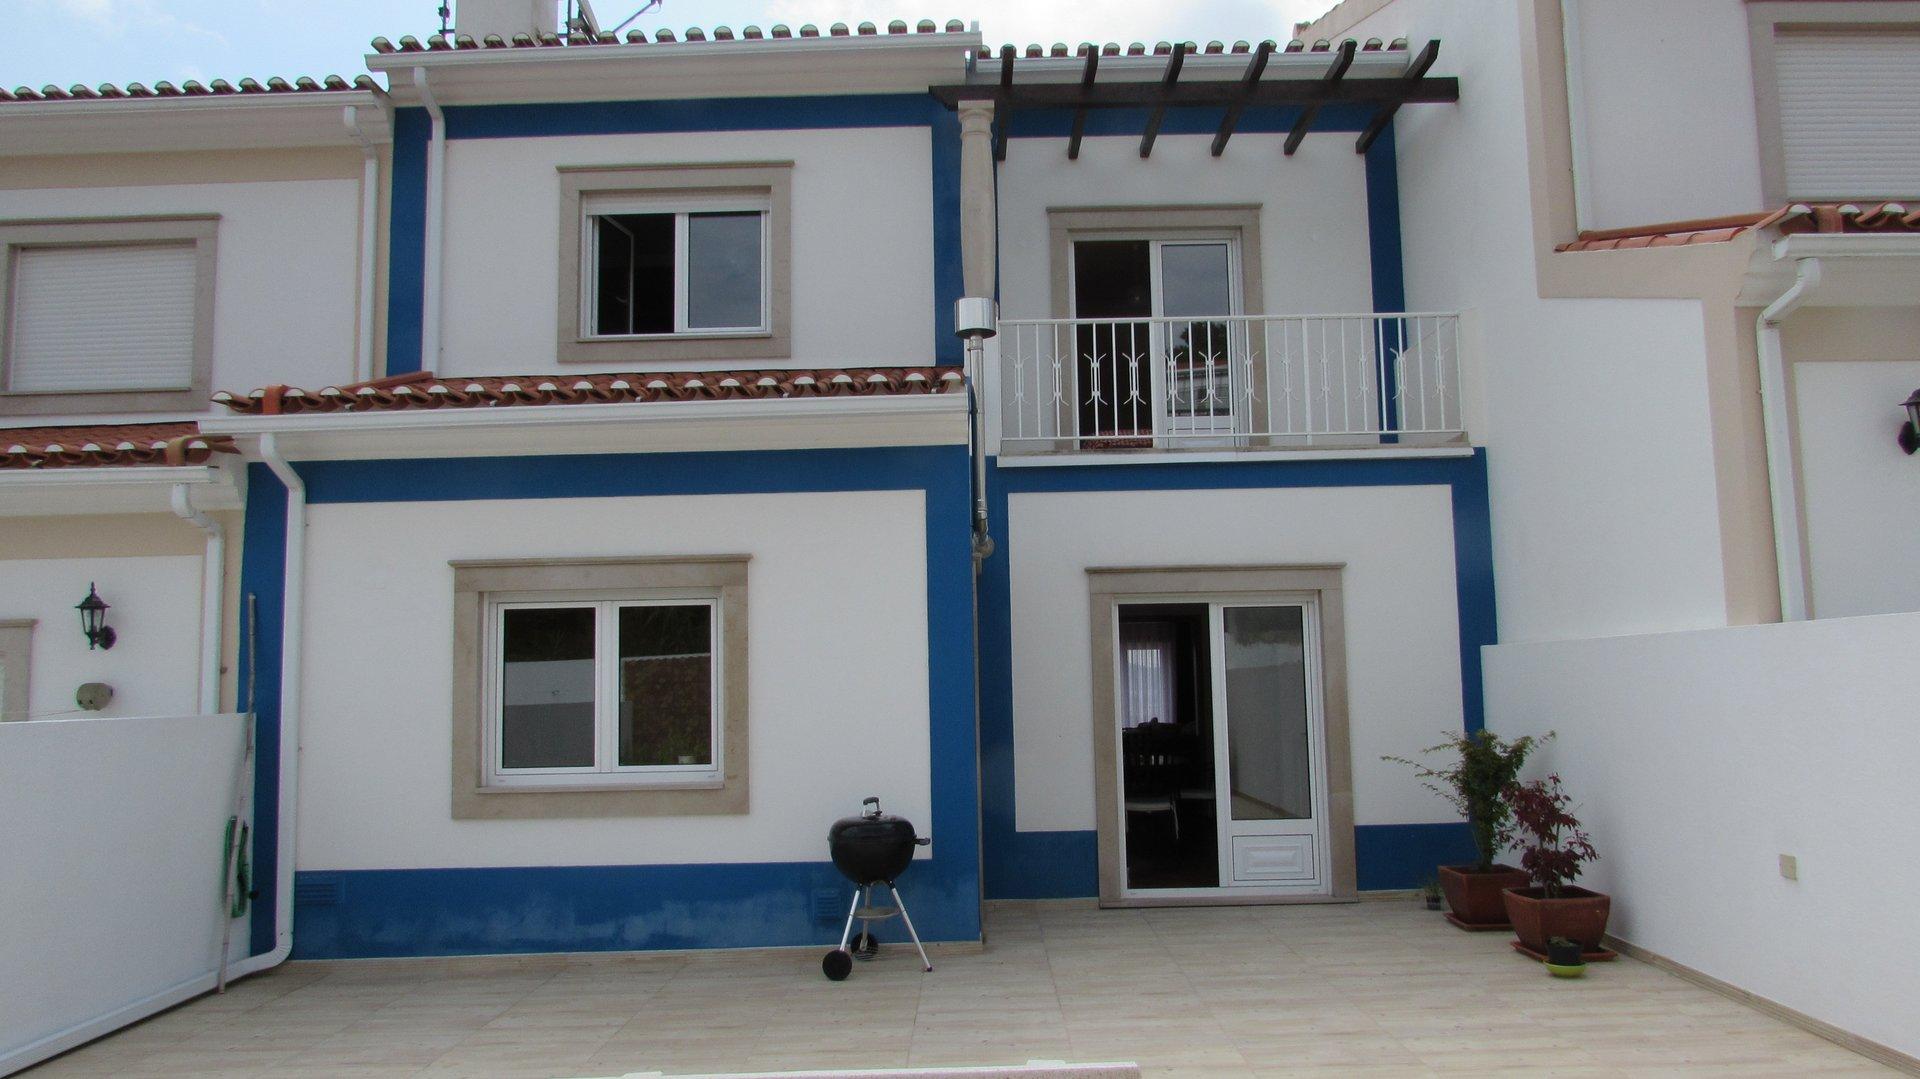 3 Bedroom Townhouse Sao Martinho do Porto, Silver Coast Ref: AV1996